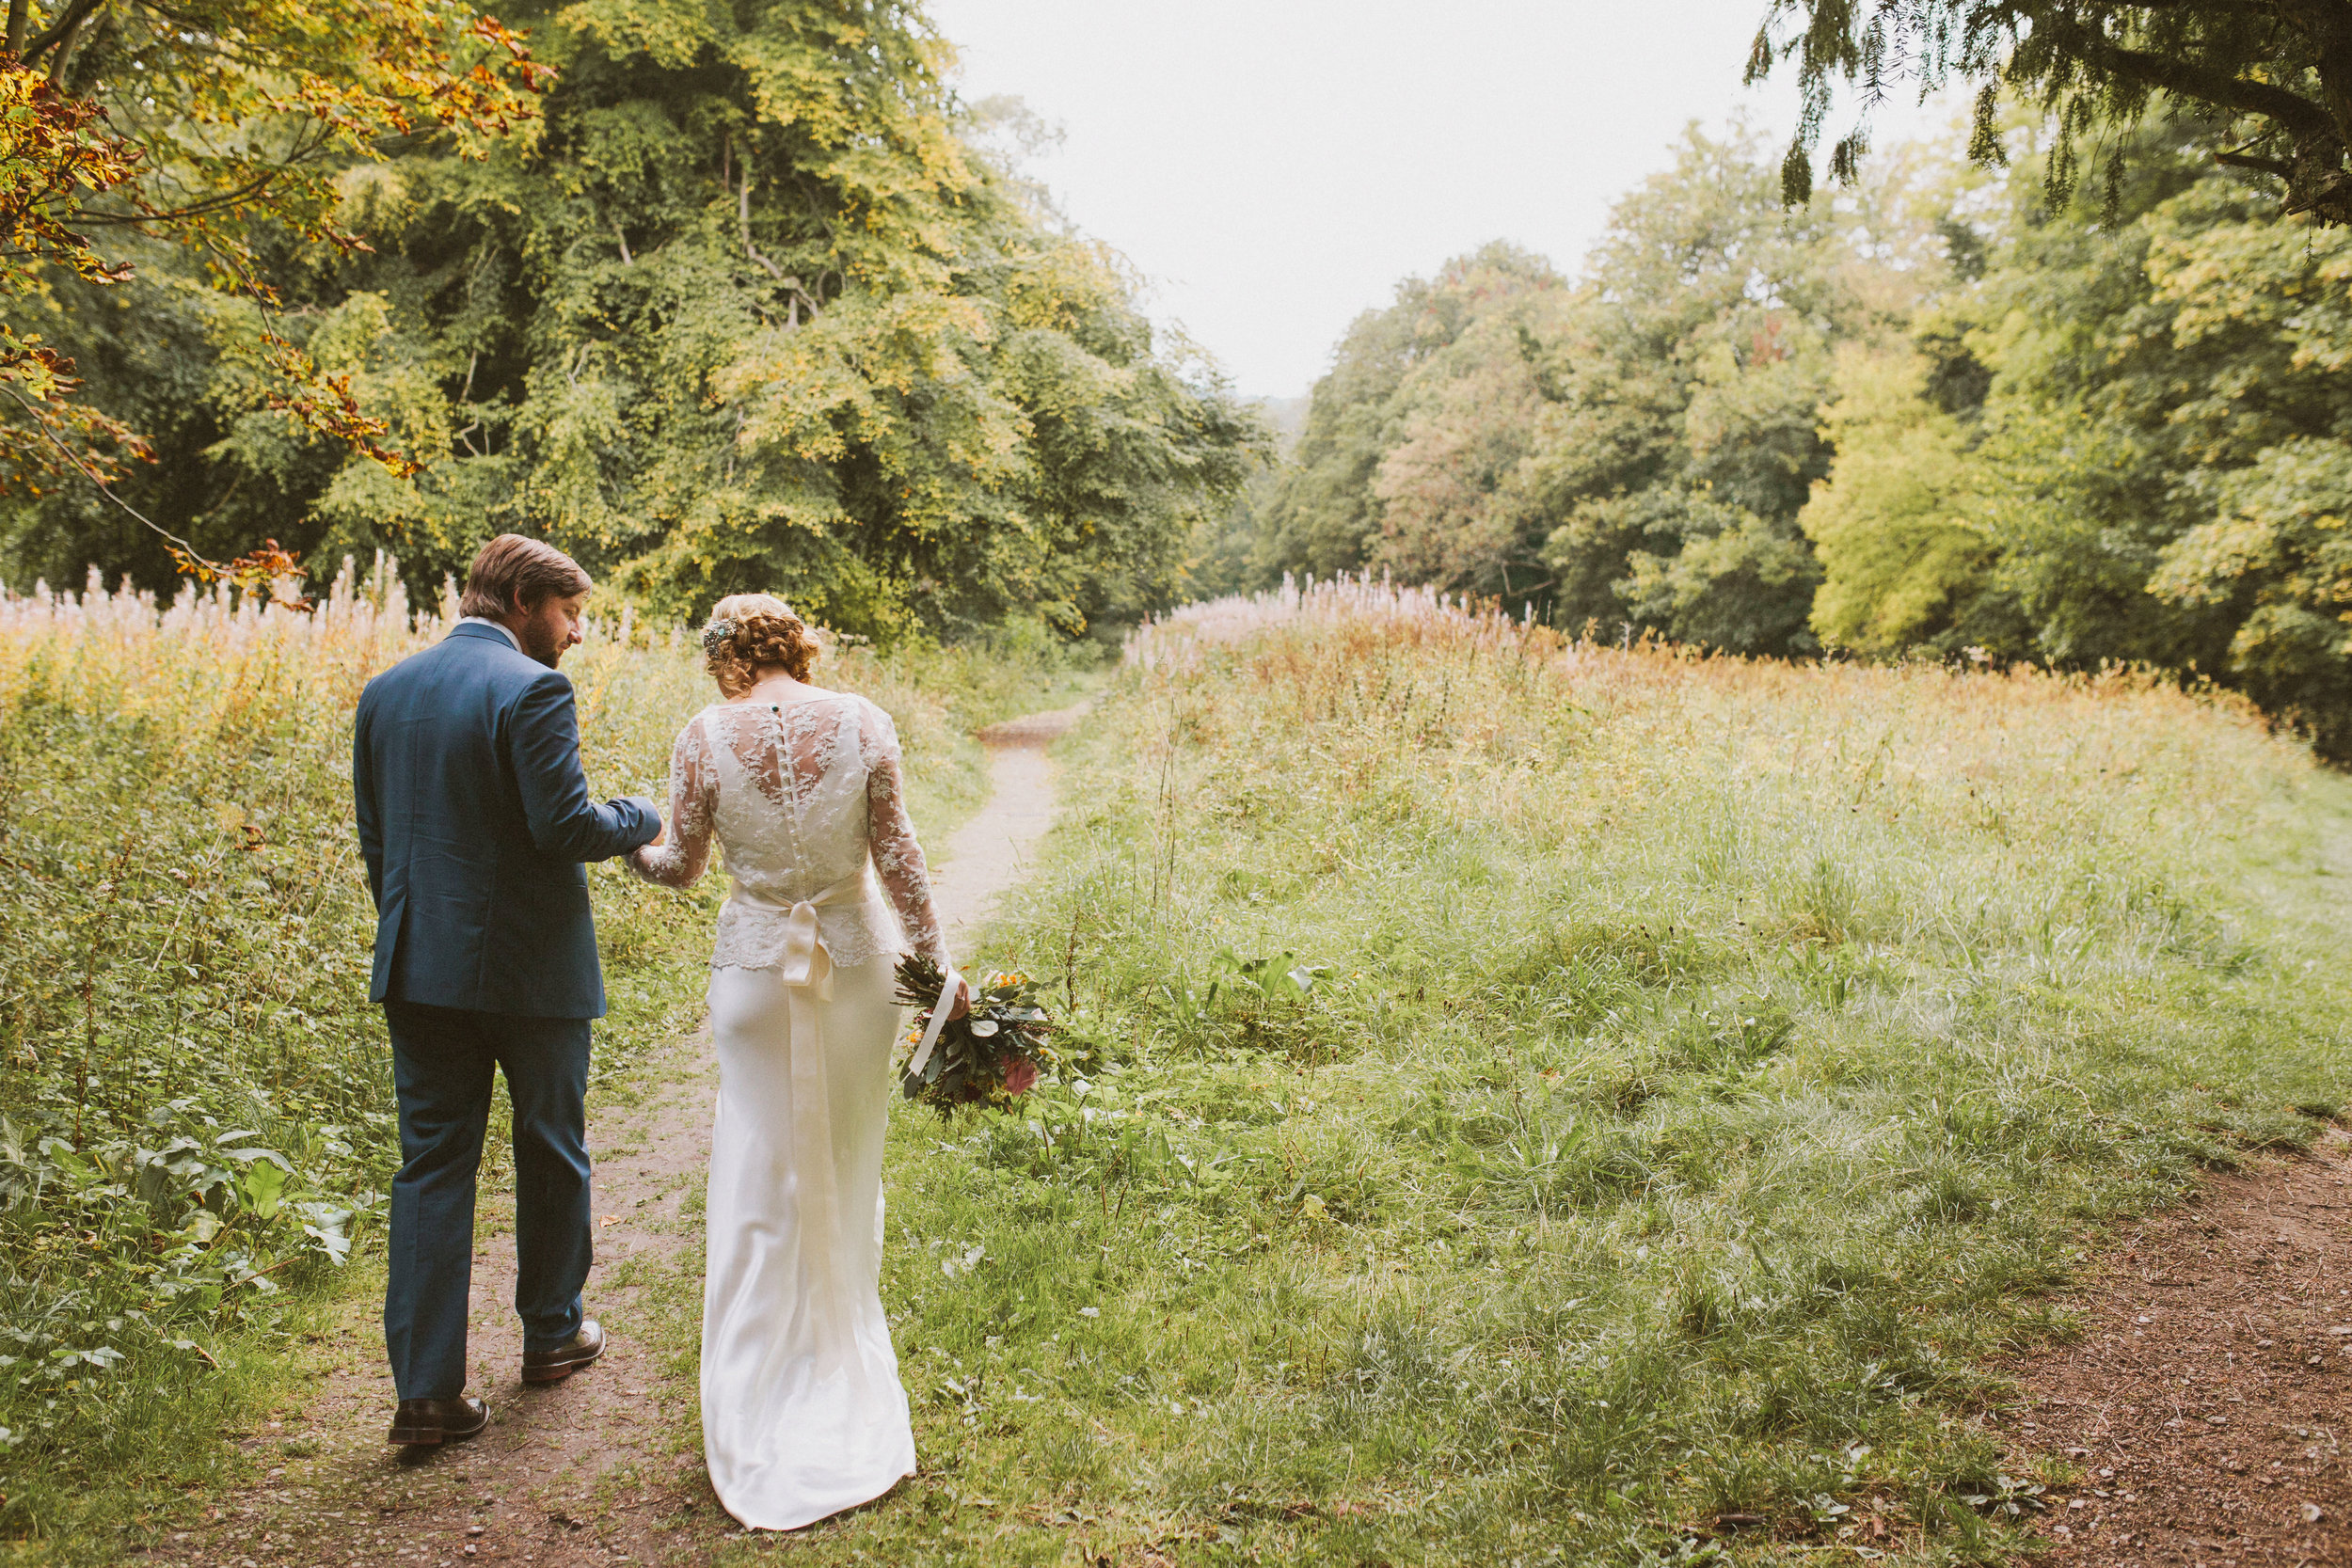 Jo-Peak-District-Autumn-Wedding-Bespoke-Vintage-Bias-Wedding-Gown-Lace-Jacket-Susanna-Greening-Matlock-11